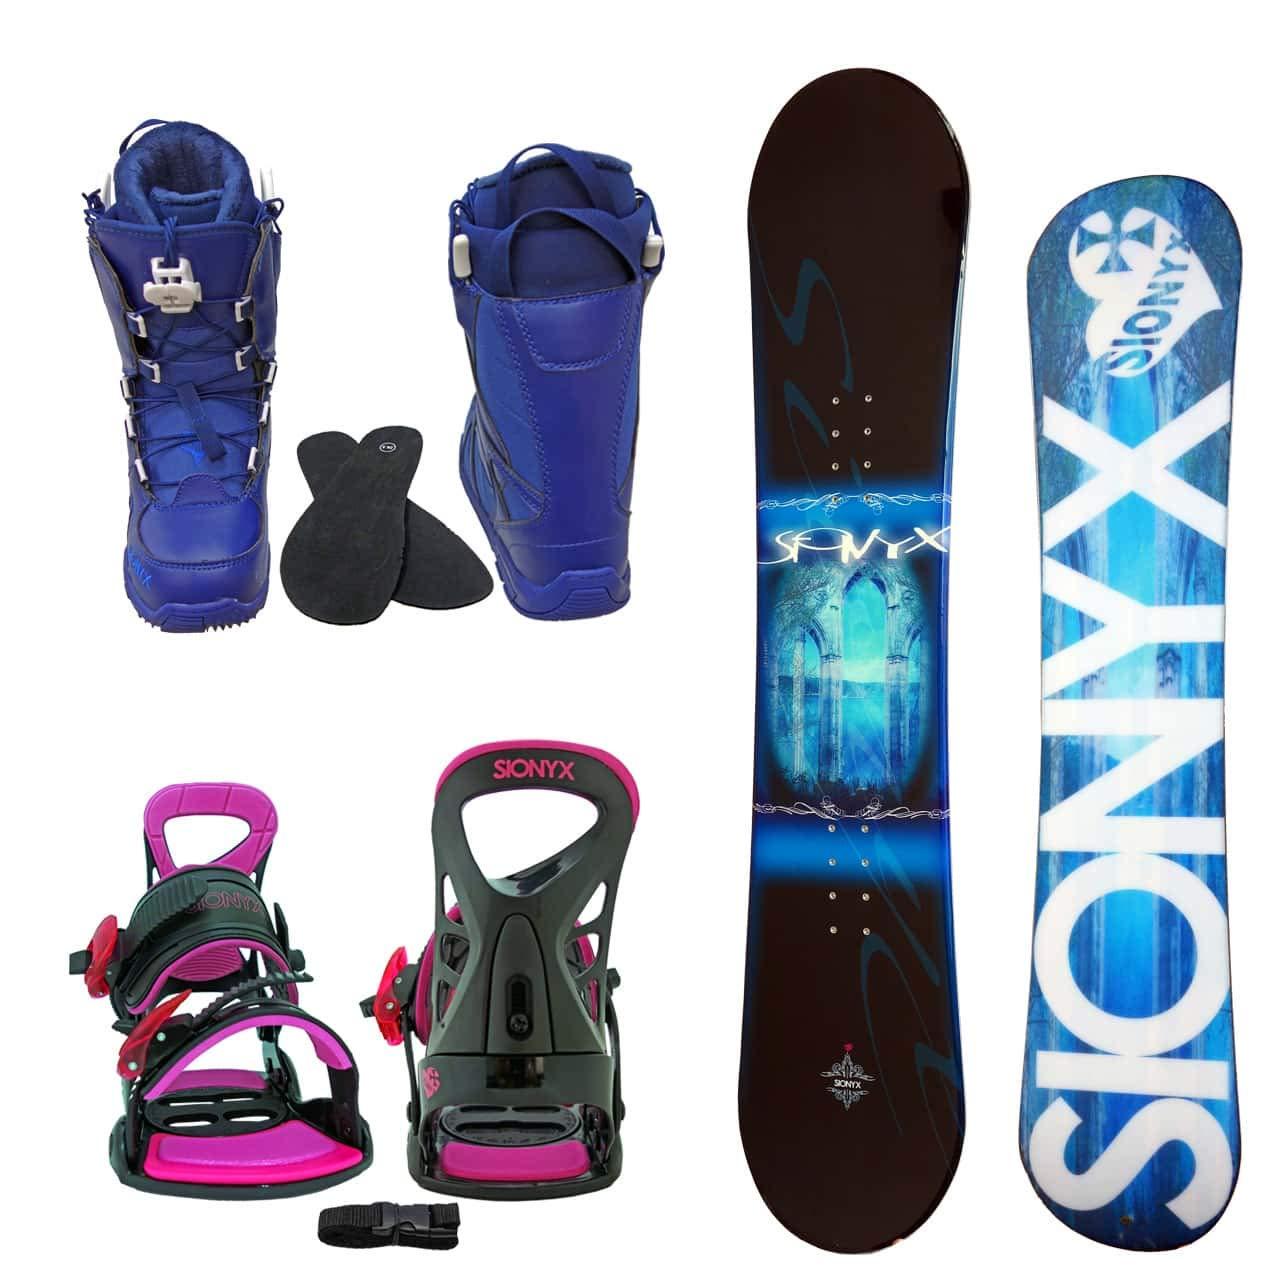 SIONYX レディース スノーボード3点セット スノボー+バインディング+クイックシューレースブーツ MONTE B07JKBTJ4G ボード 144+boots 25.0 ボード サックス+binding ピンク+boots ブルー ボード サックス+binding ピンク+boots ブルー ボード 144+boots 25.0